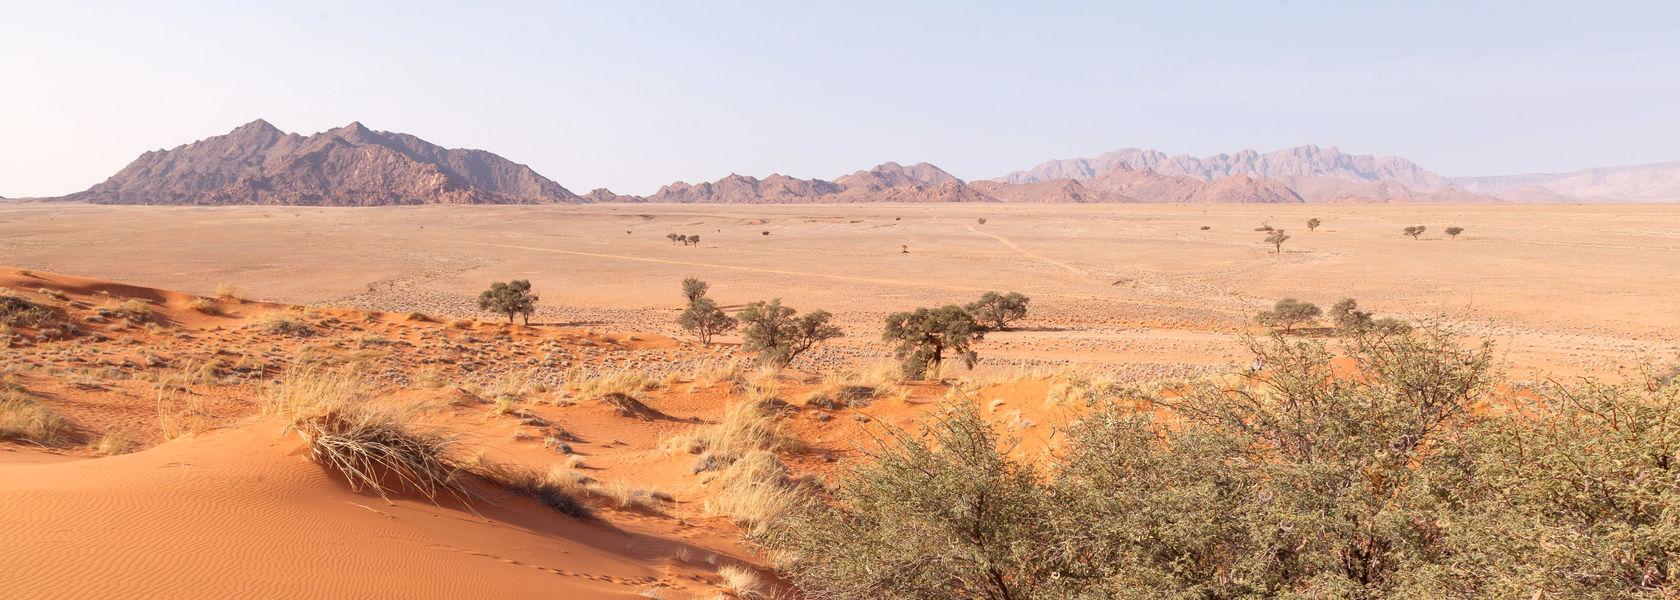 Klimaat & weer Namibië - Beste reistijd Namibië | Matoke Tours